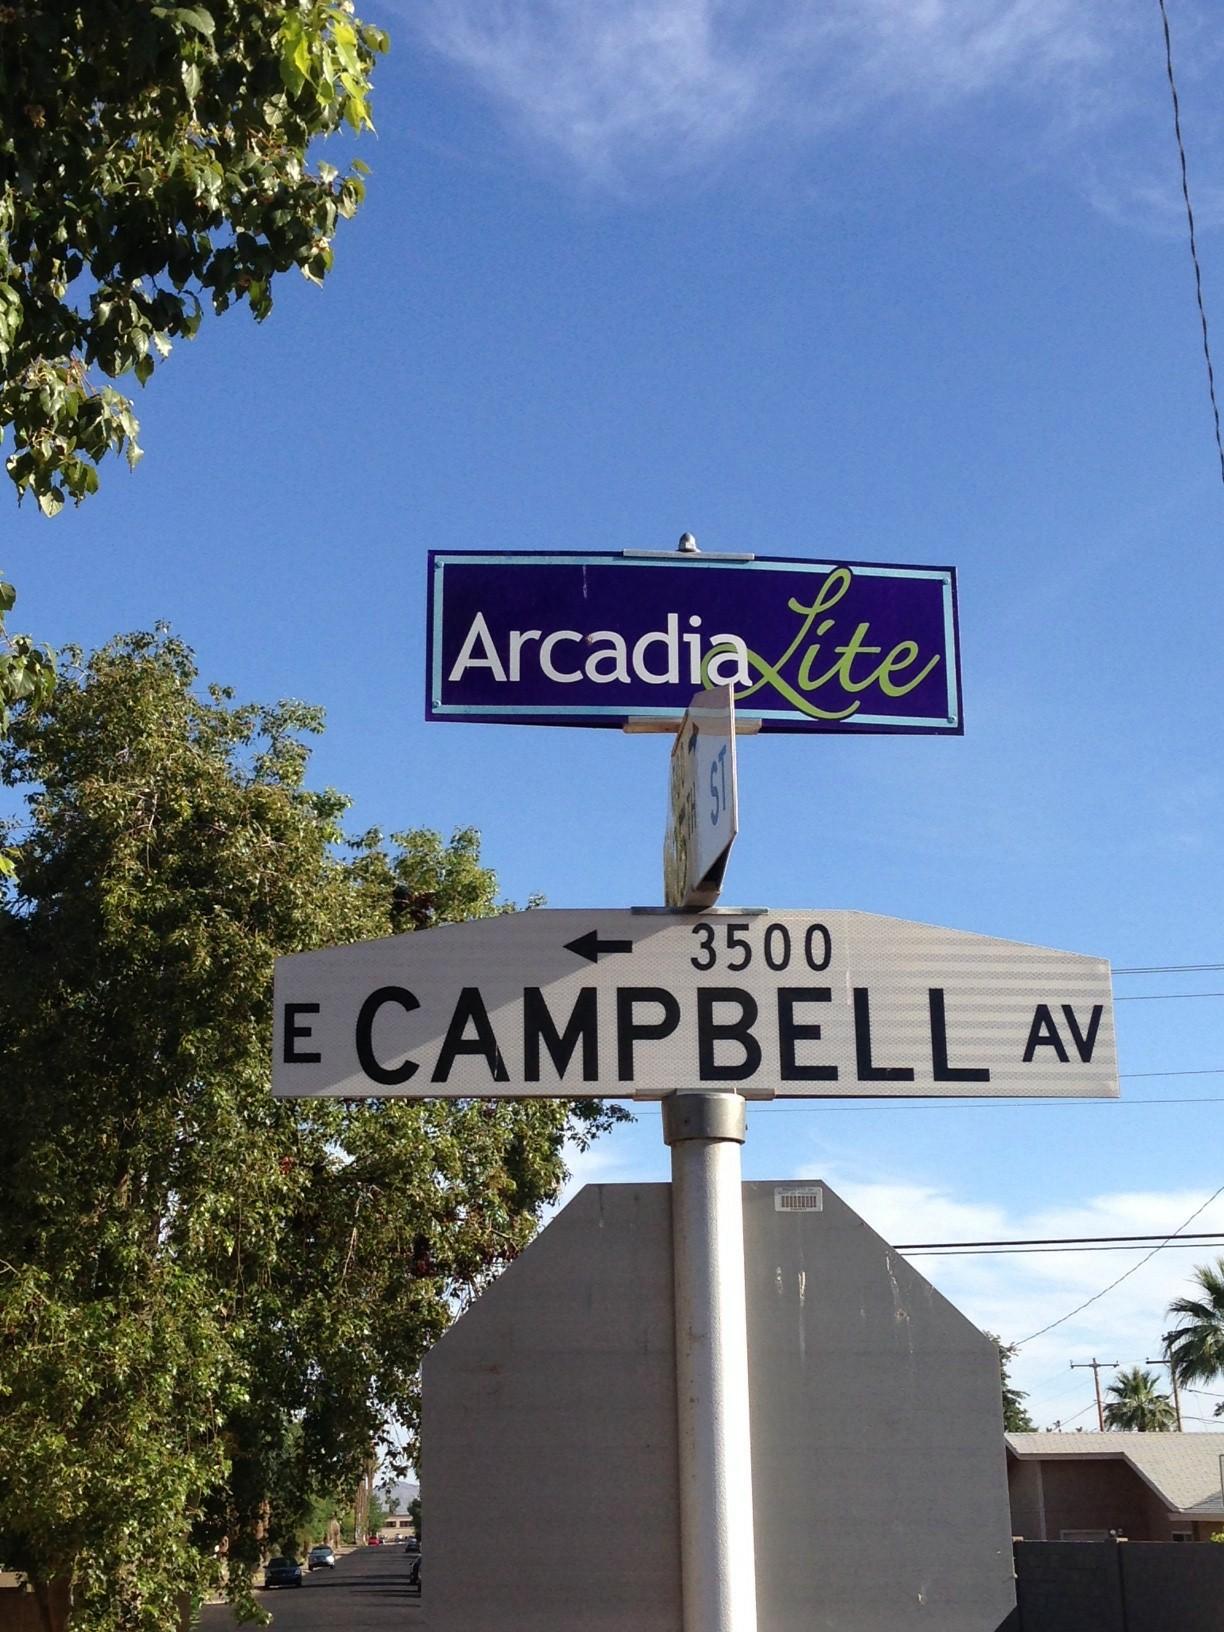 Arcadia Lite - Arcadia Real Estate | Arcadia Homes